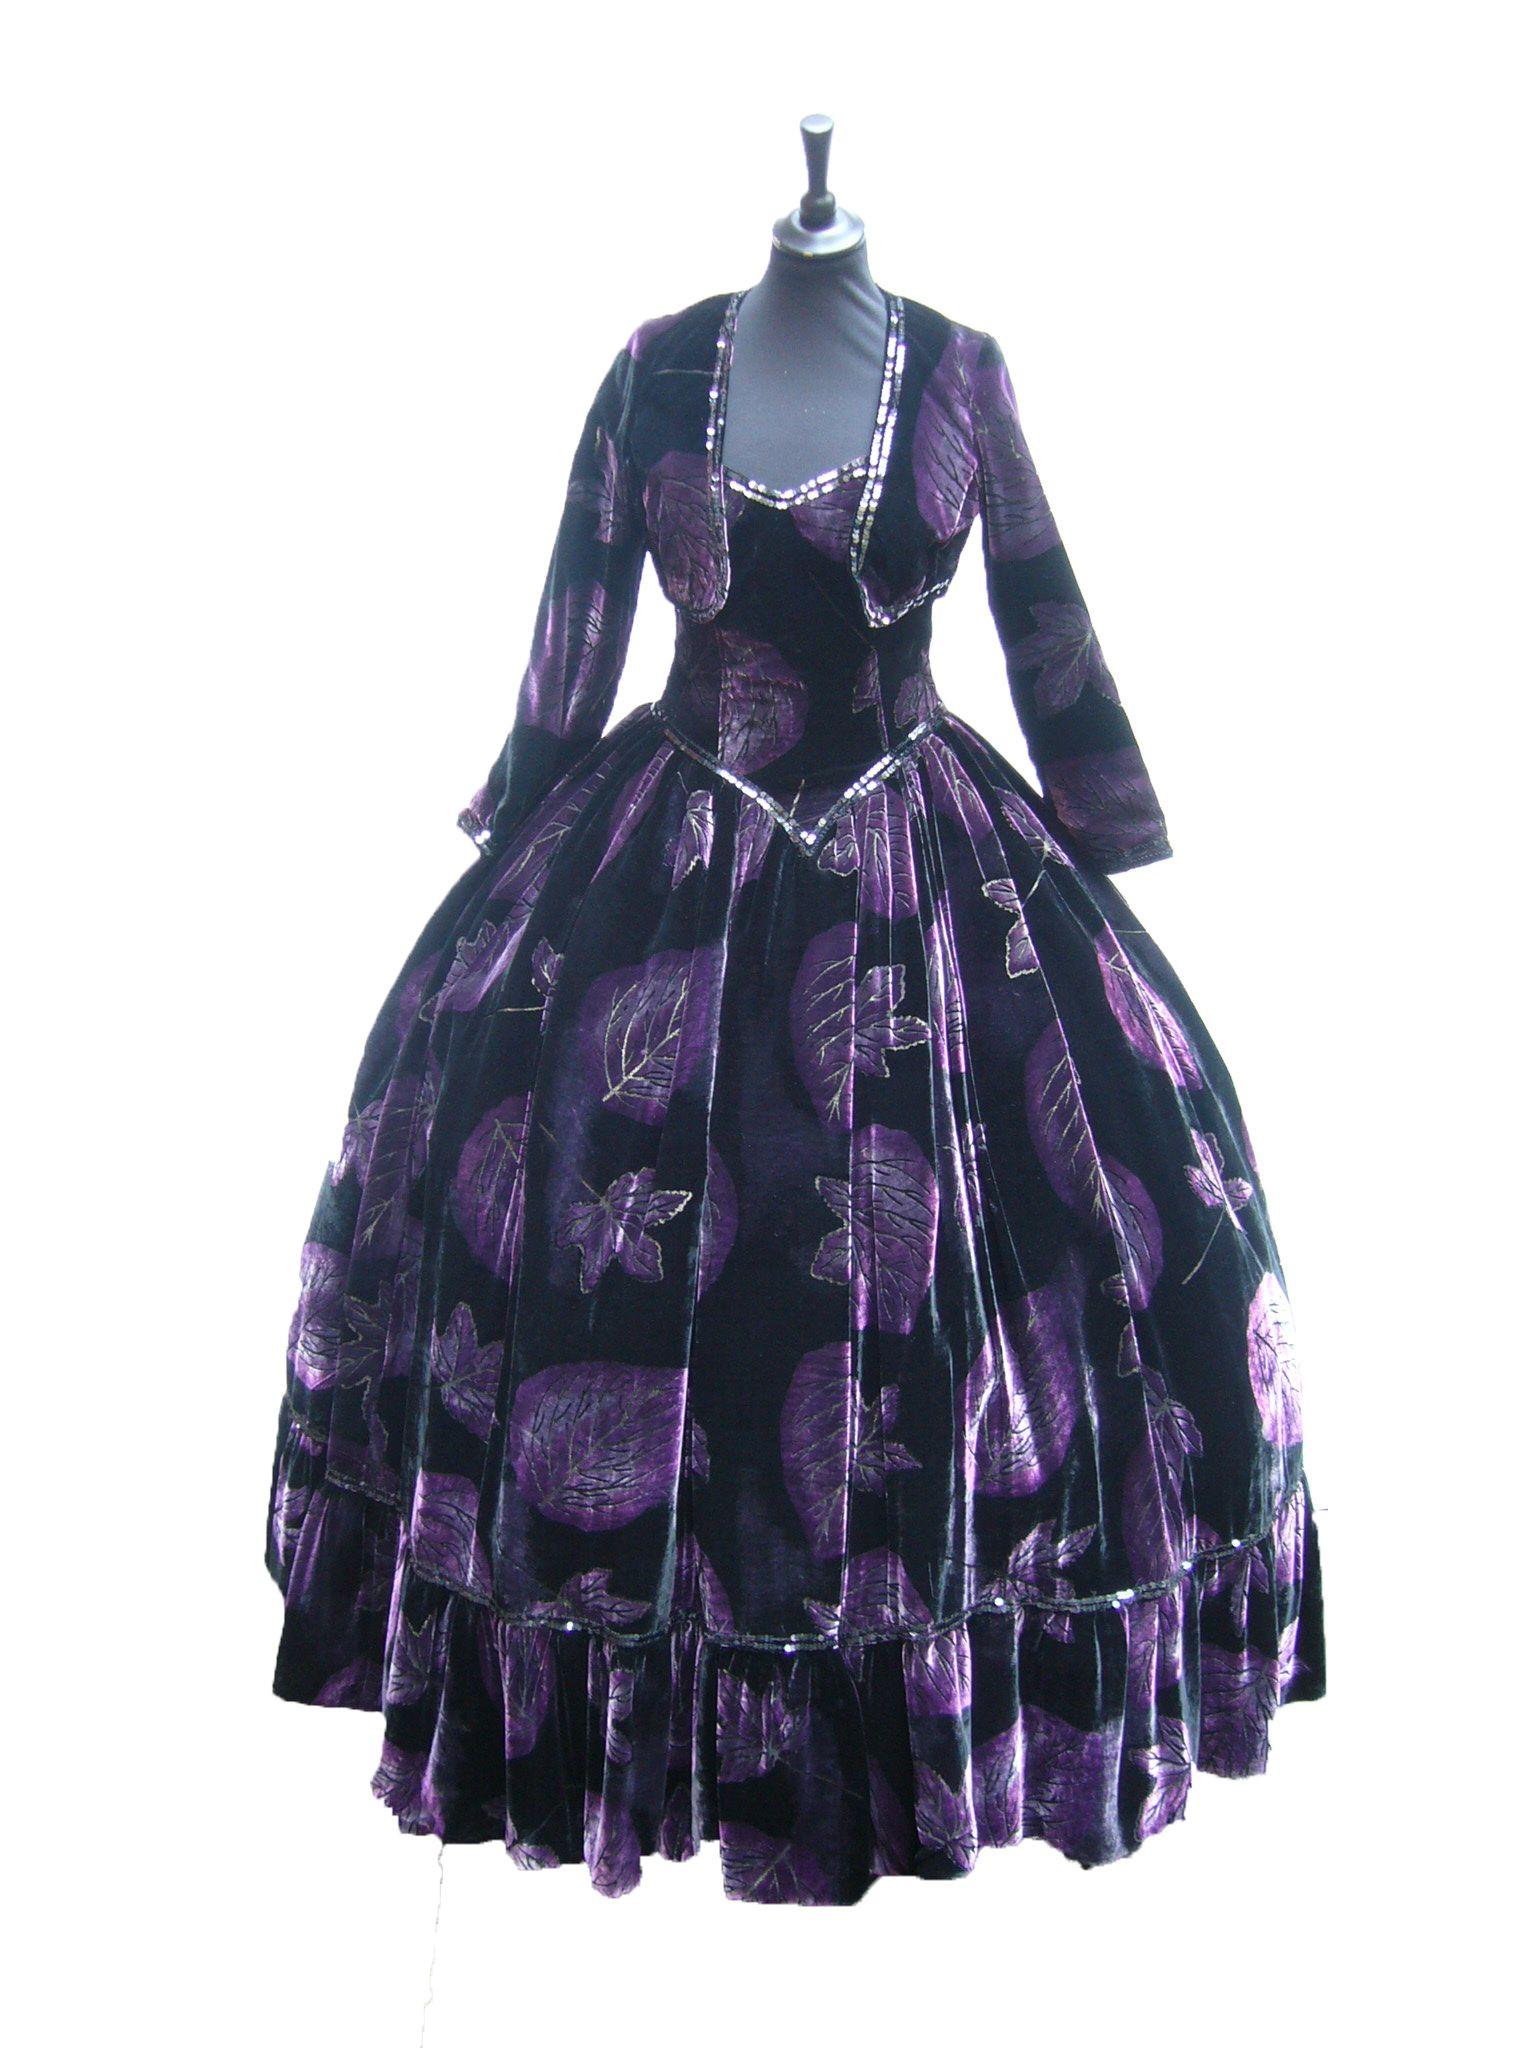 Venice Atelier historical costume 1800s #historical #costume #dress #carnival #1800s  sc 1 st  Pinterest & Venice Atelier: historical costume 1800s #historical #costume #dress ...